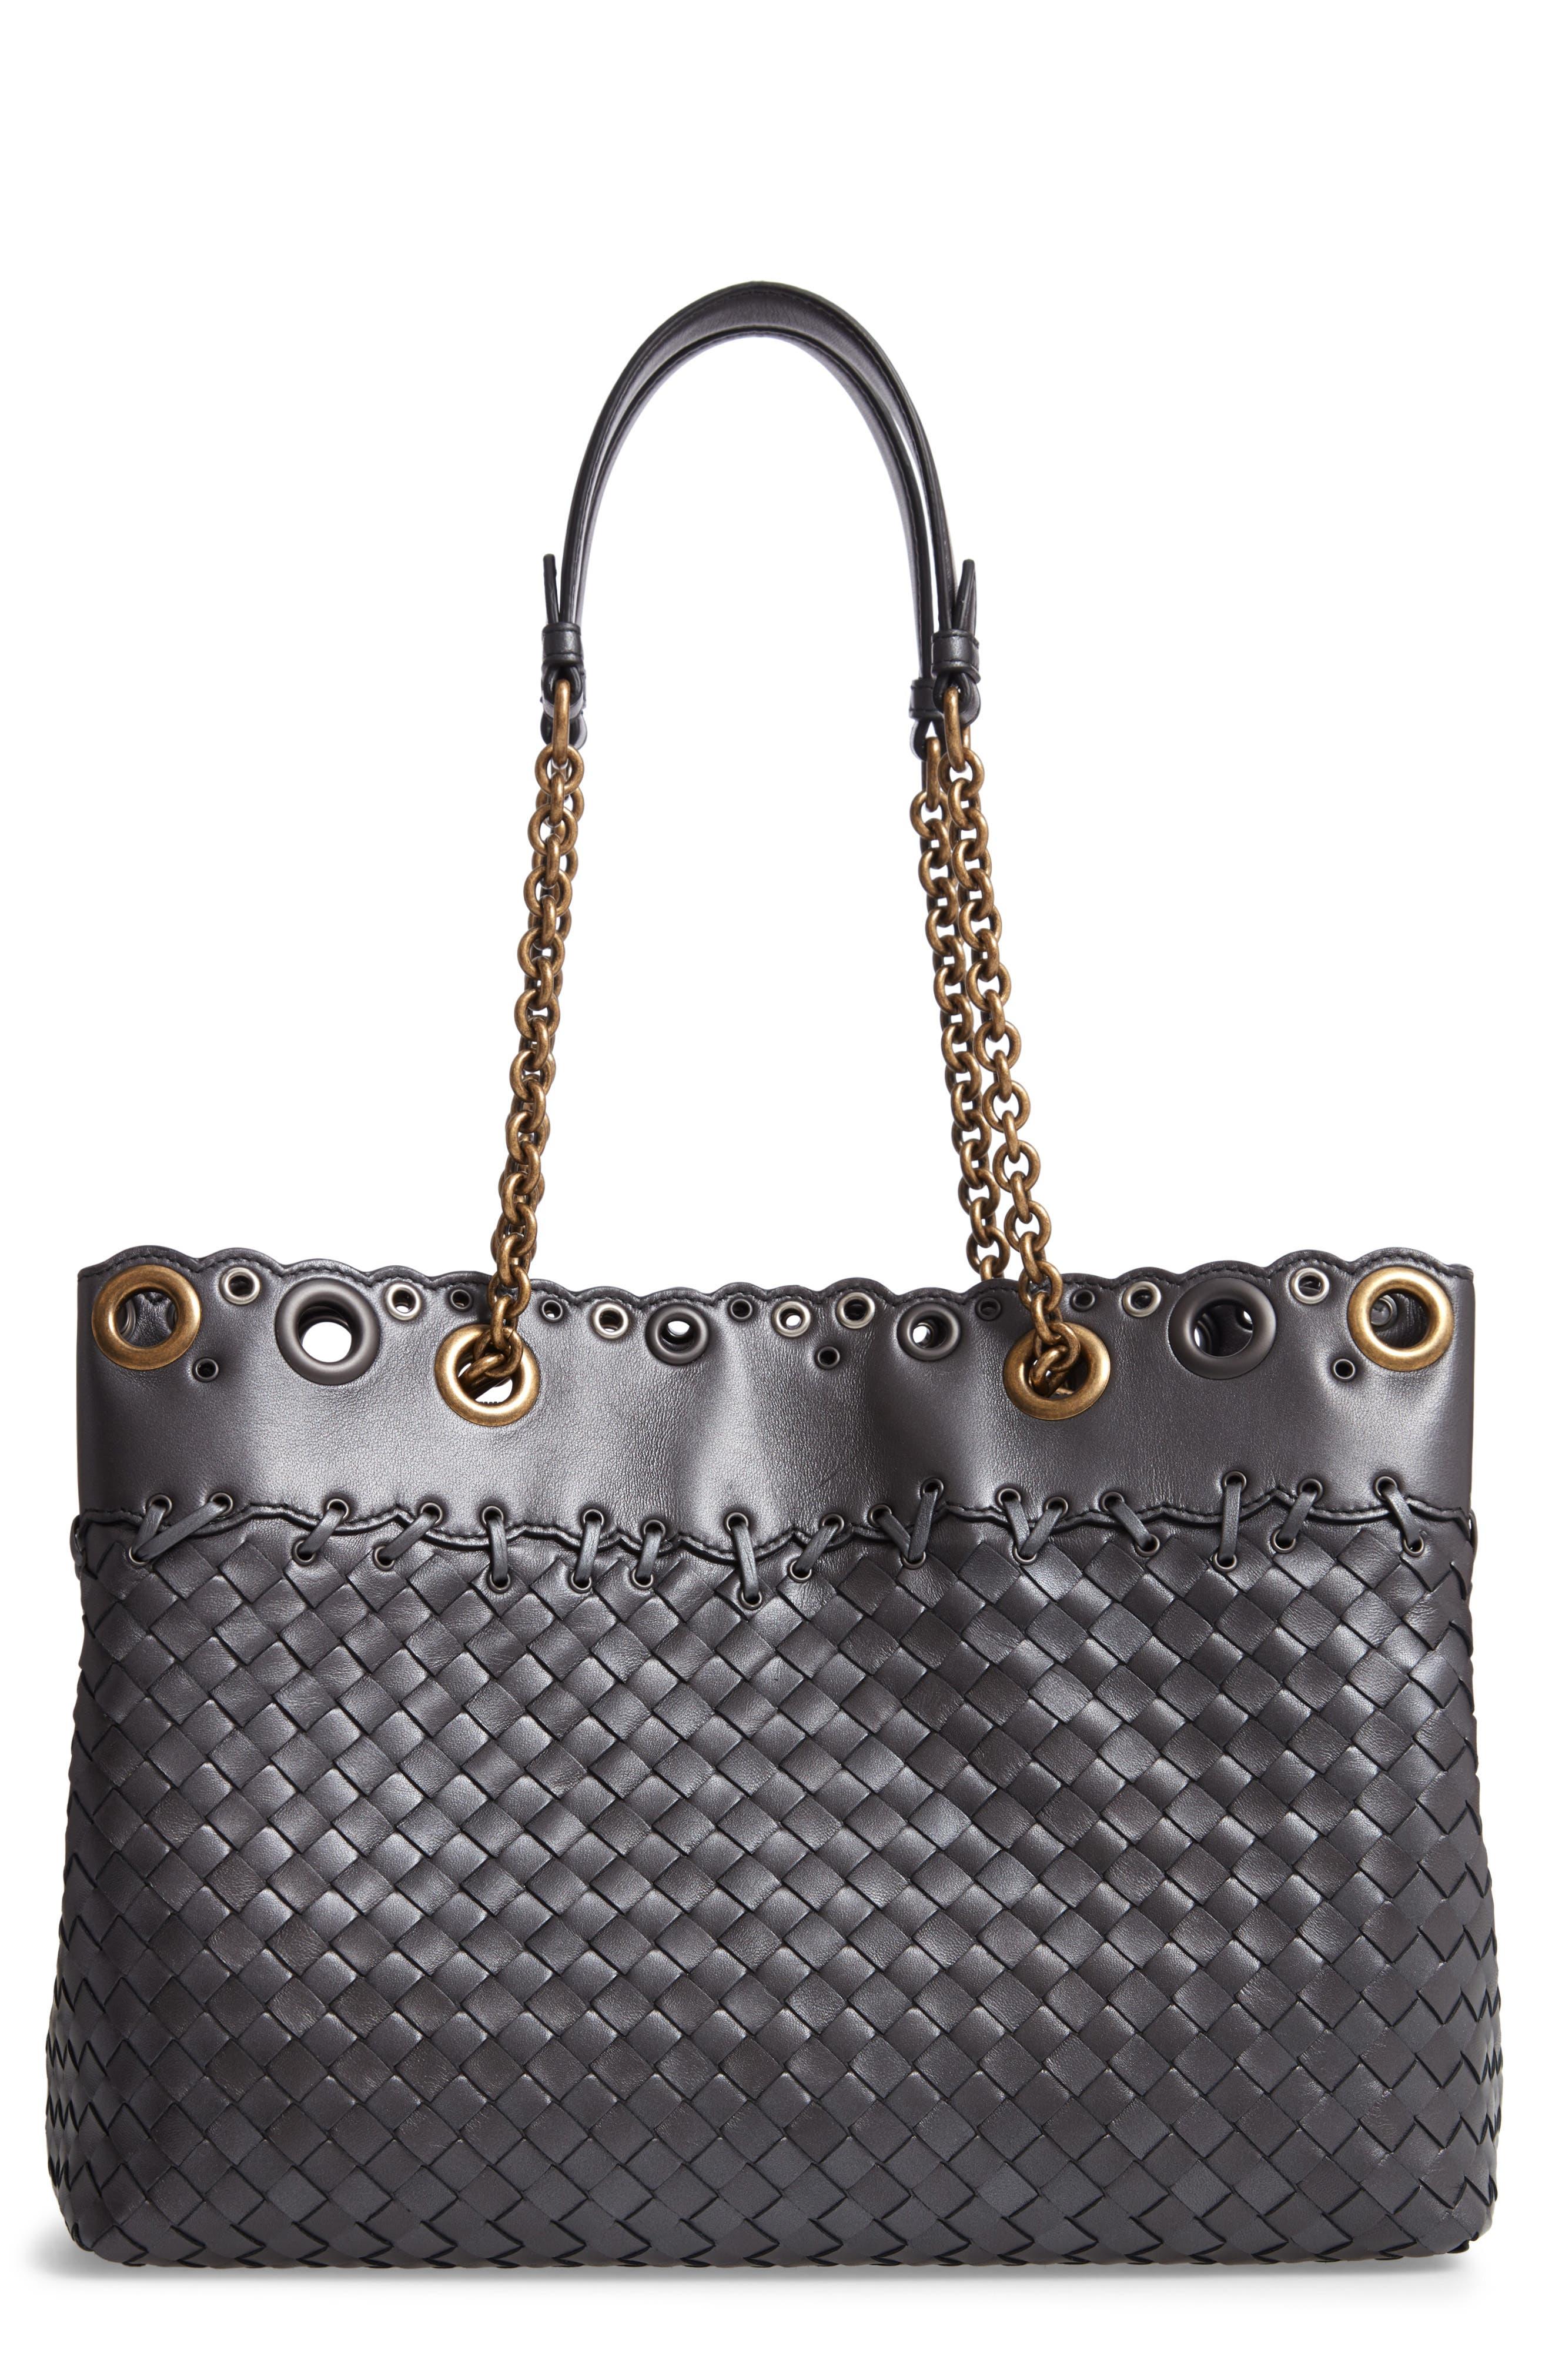 Intrecciato Leather Tote Bag,                             Main thumbnail 1, color,                             040